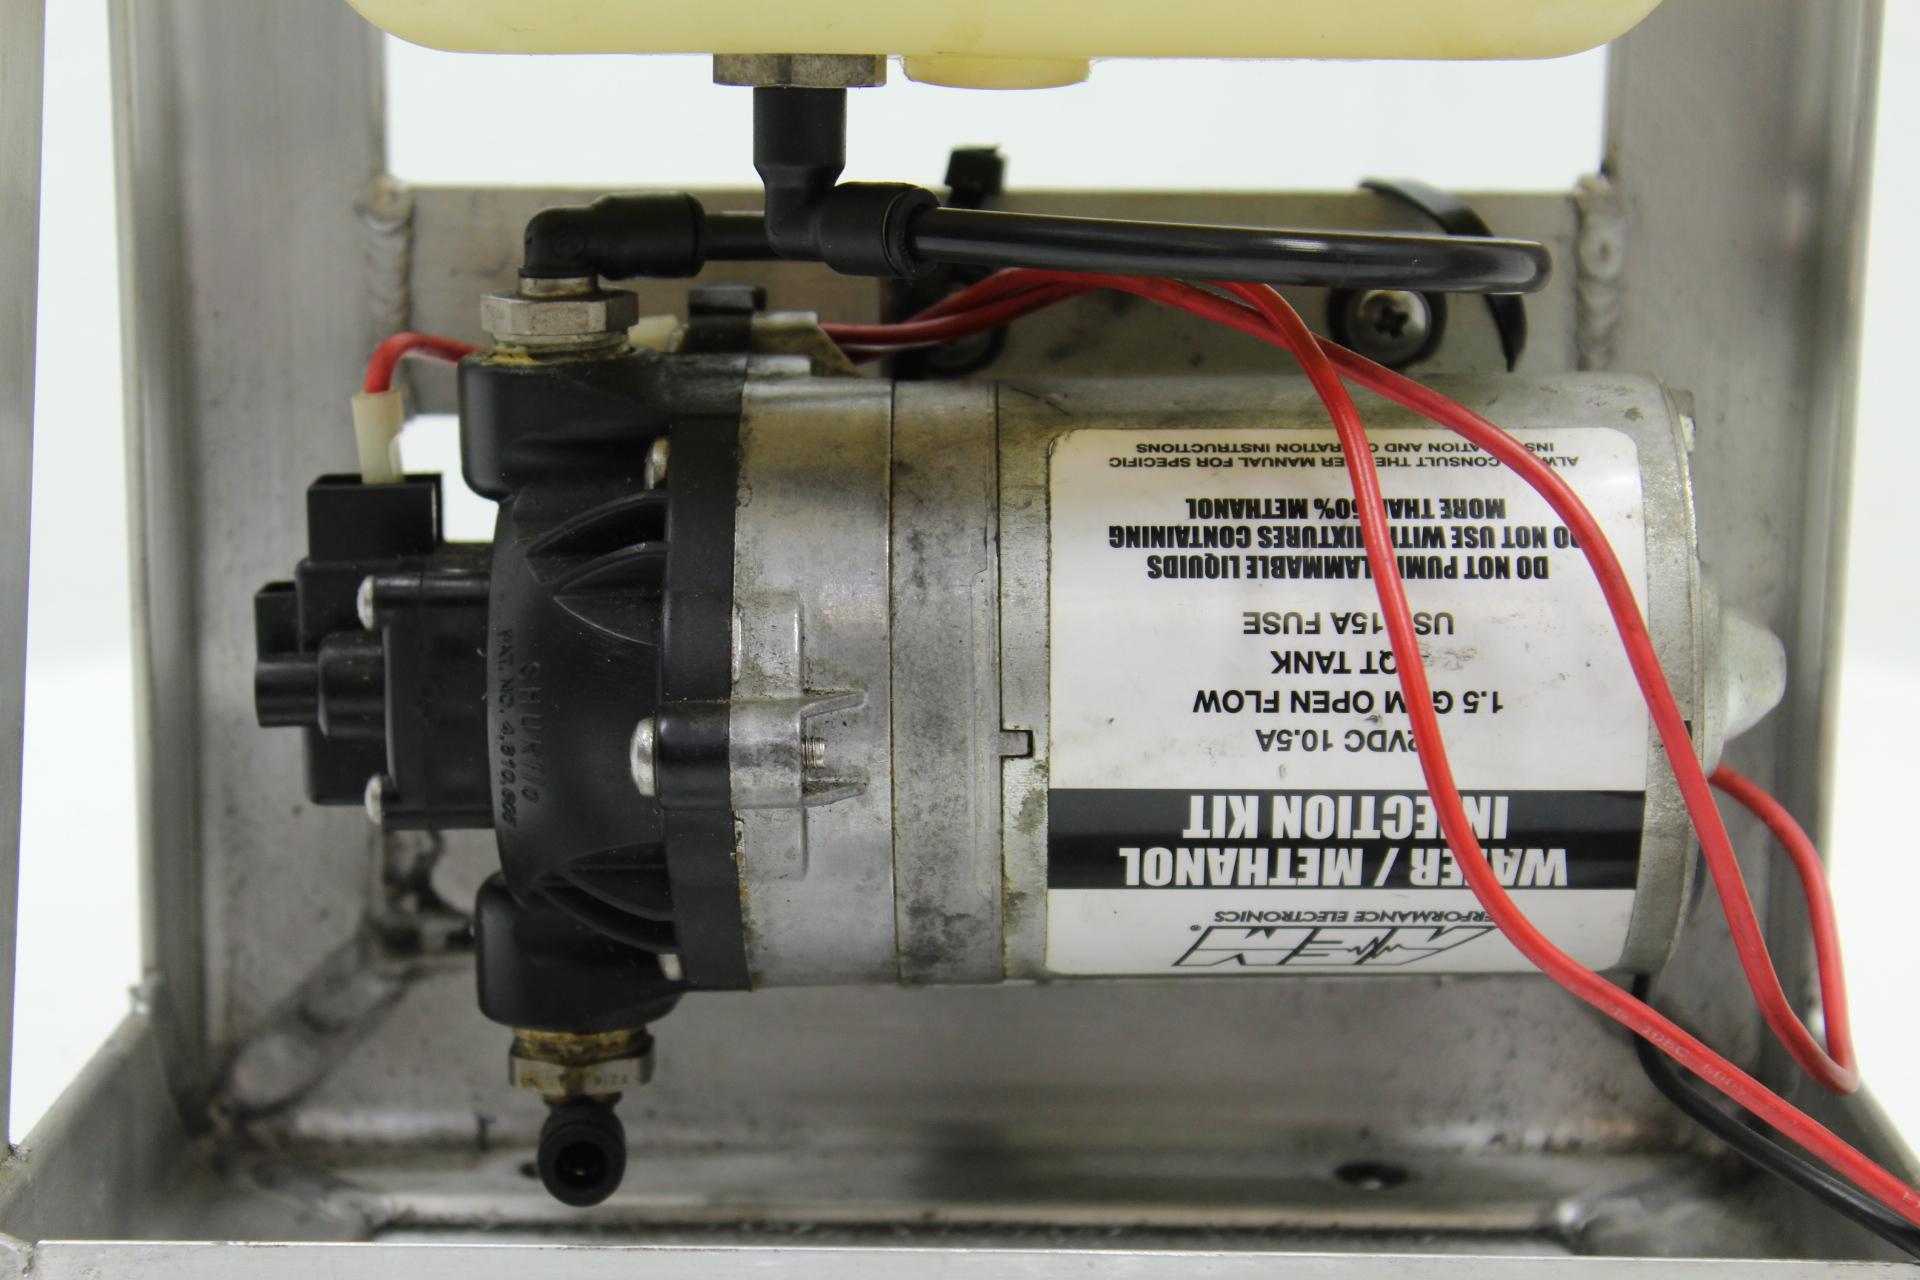 2002 2007 Subaru Impreza Wrx Sti Aem Water Methanol Injection Kit Wiring Harness Meth